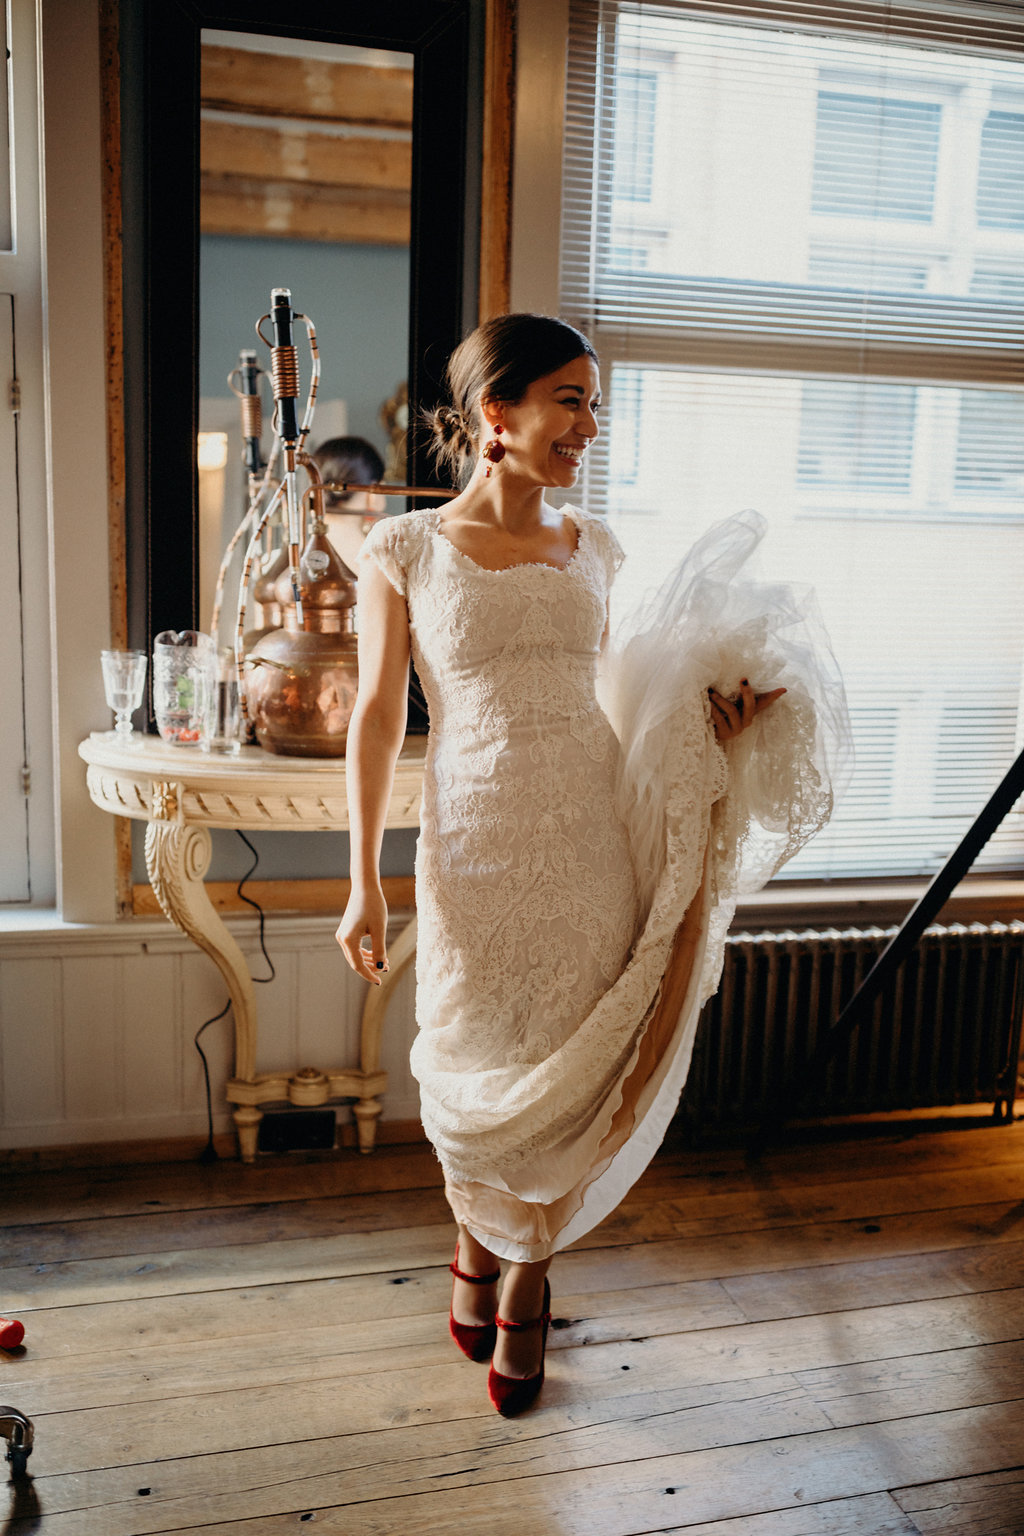 101-sjoerdbooijphotography-wedding-coen-janaina.jpg